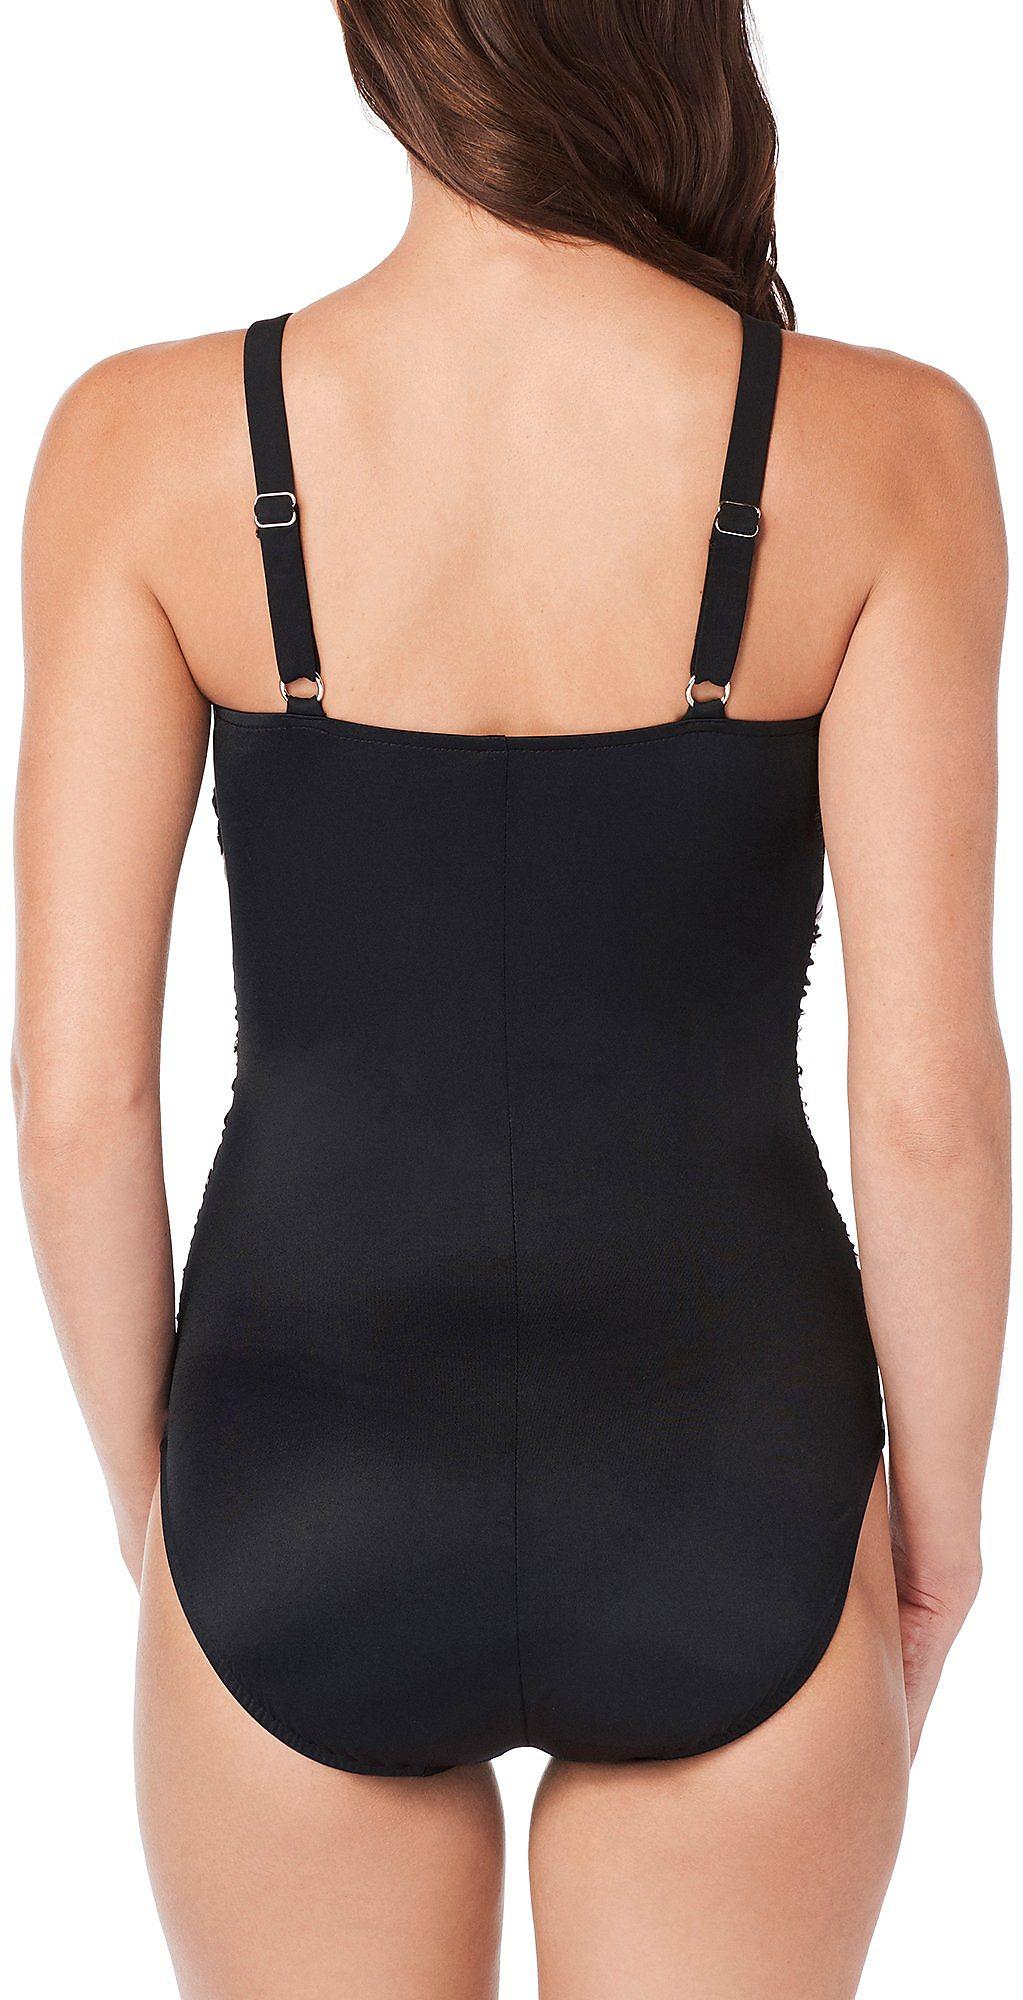 2381f9c5d17 Trimshaper Womens Hard To Be Leaf Lexie One Piece Swimsuit | eBay